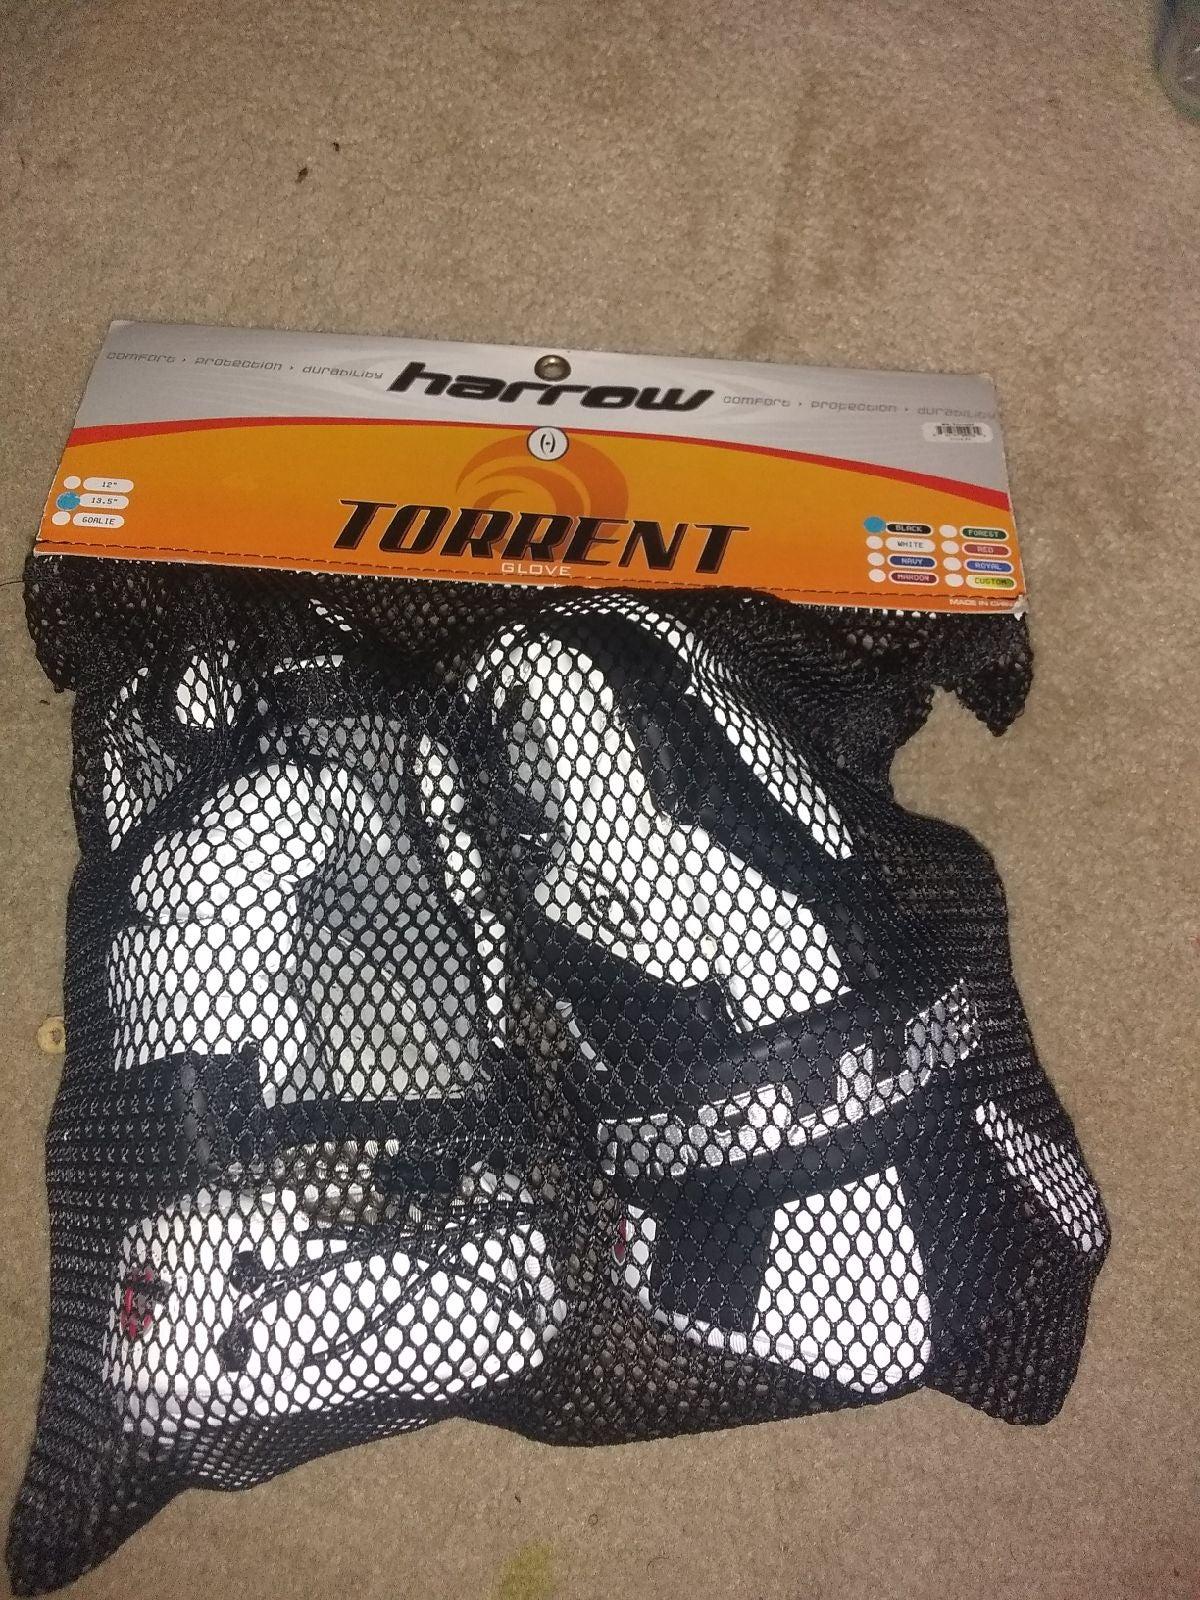 Lacrosse  Torrent Glove Harrow 13.5